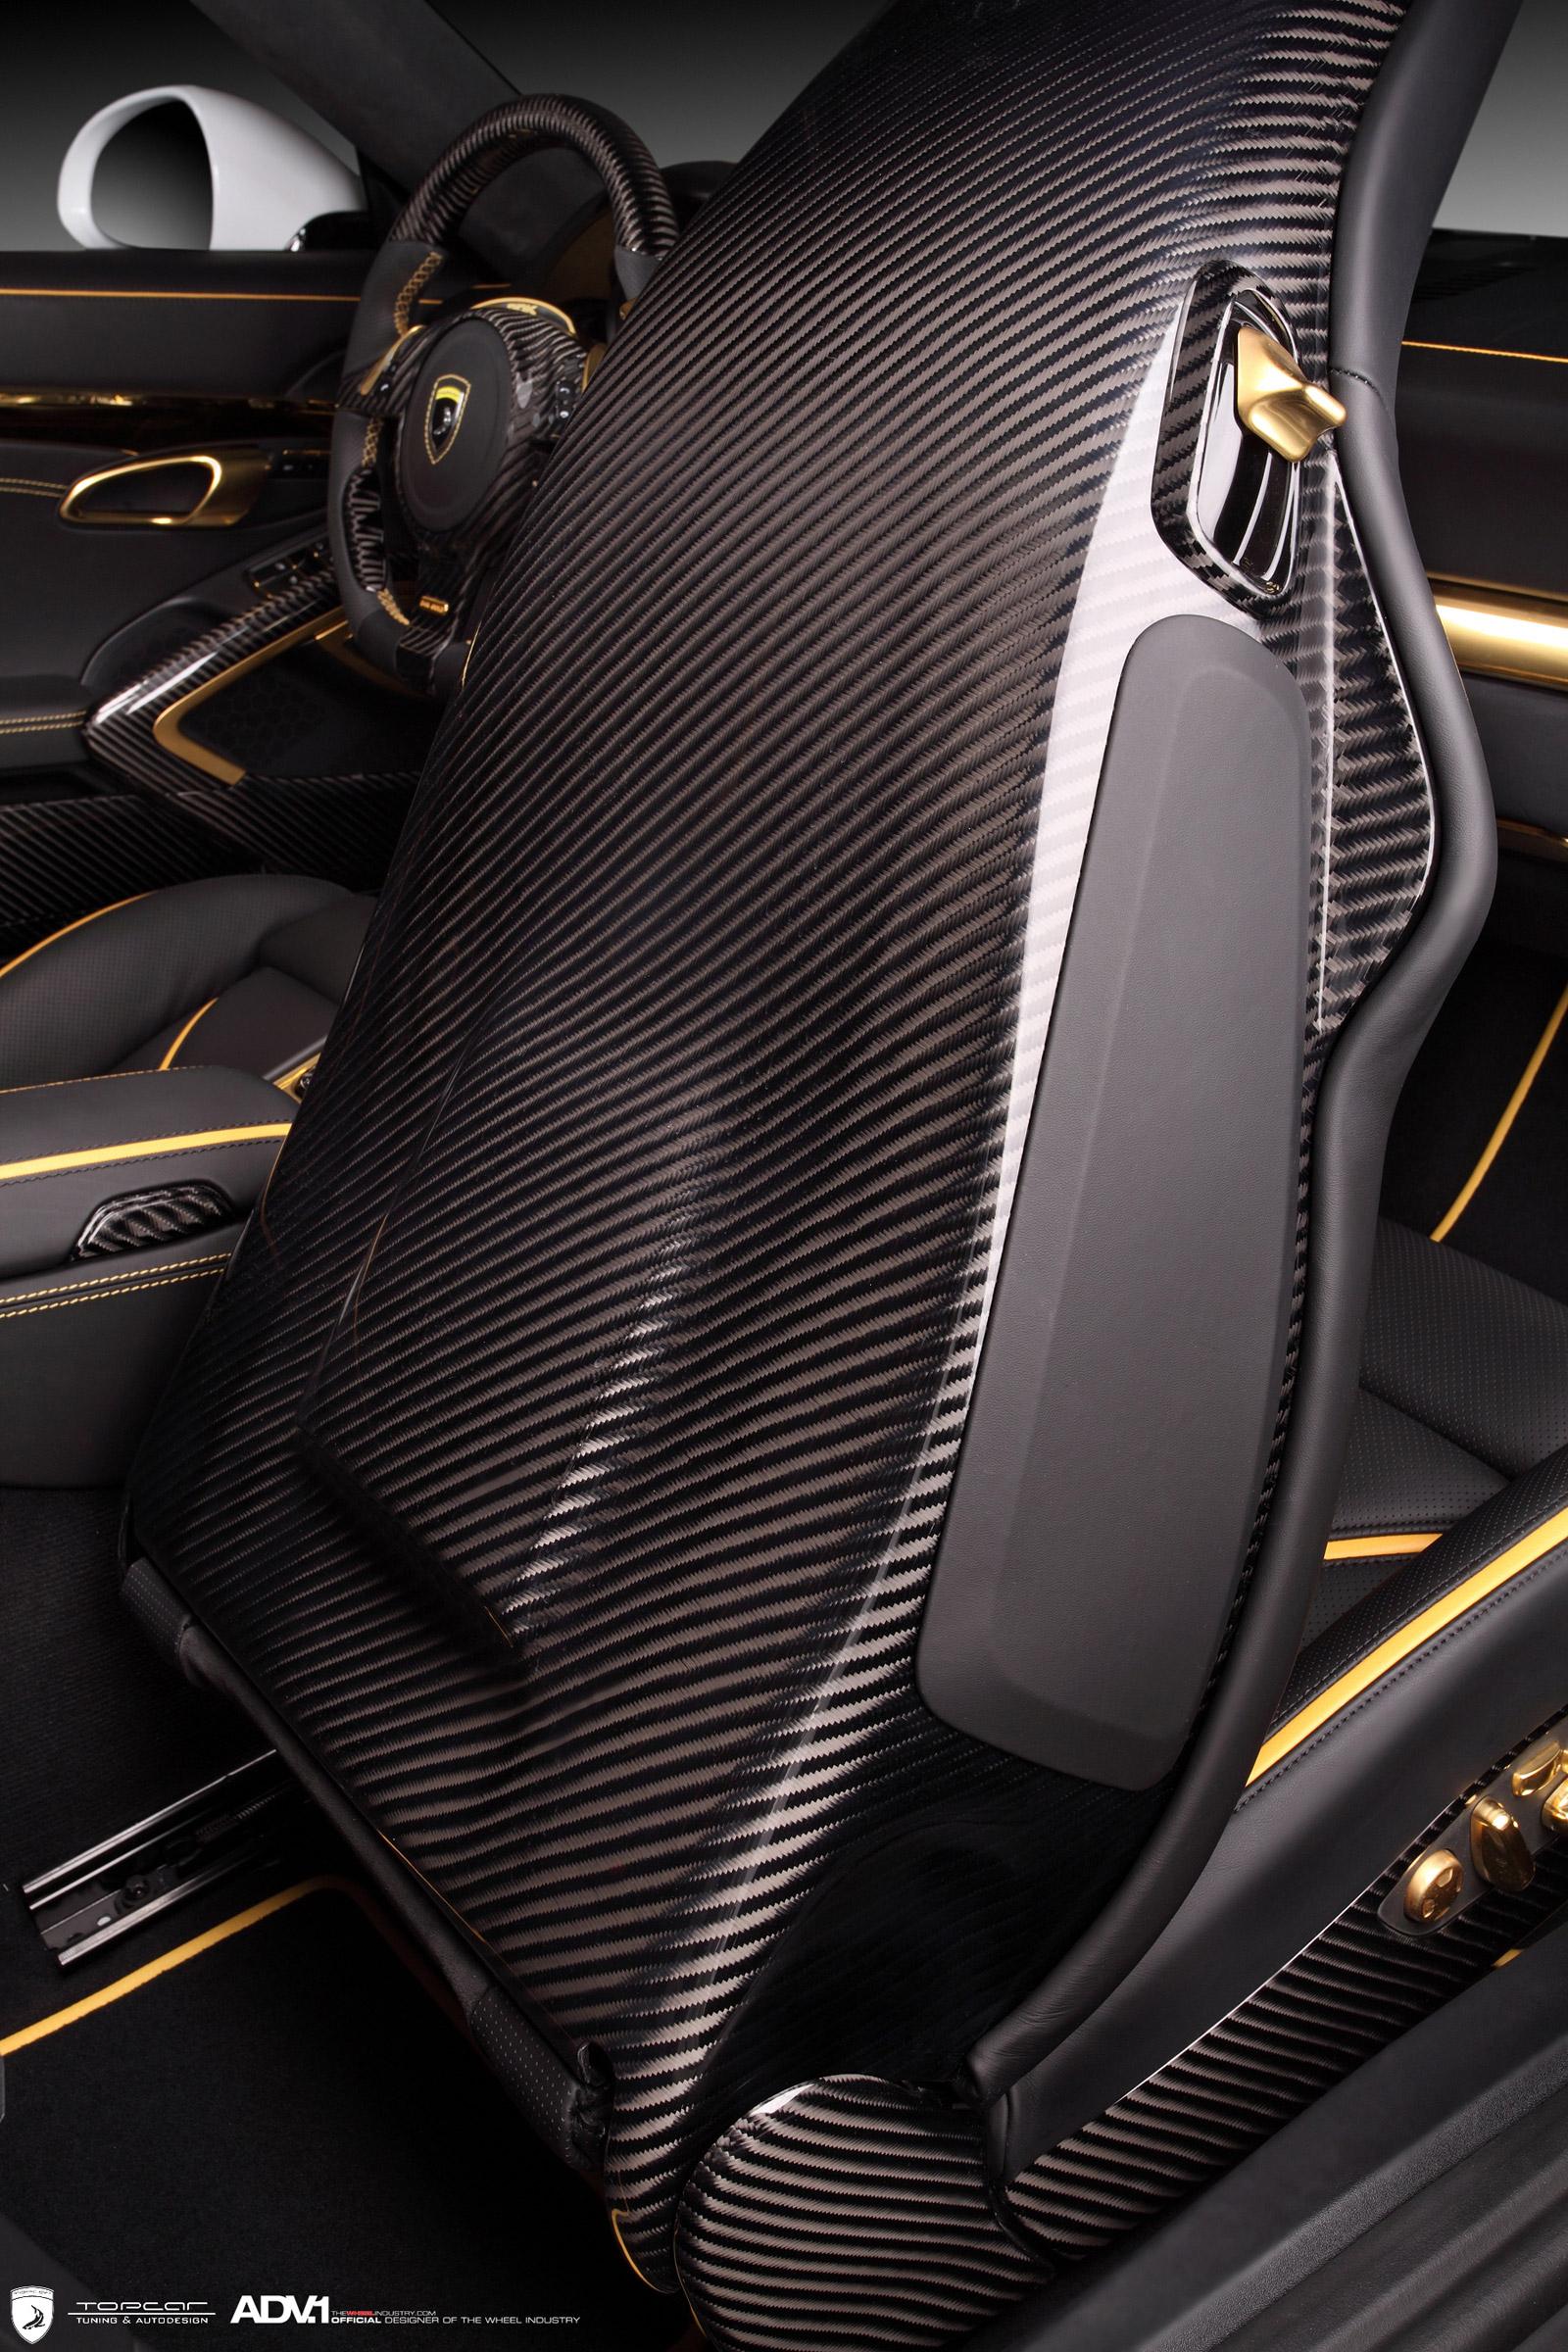 porsche-911-turbo-typ-991-topcar-stinger-gtr-027